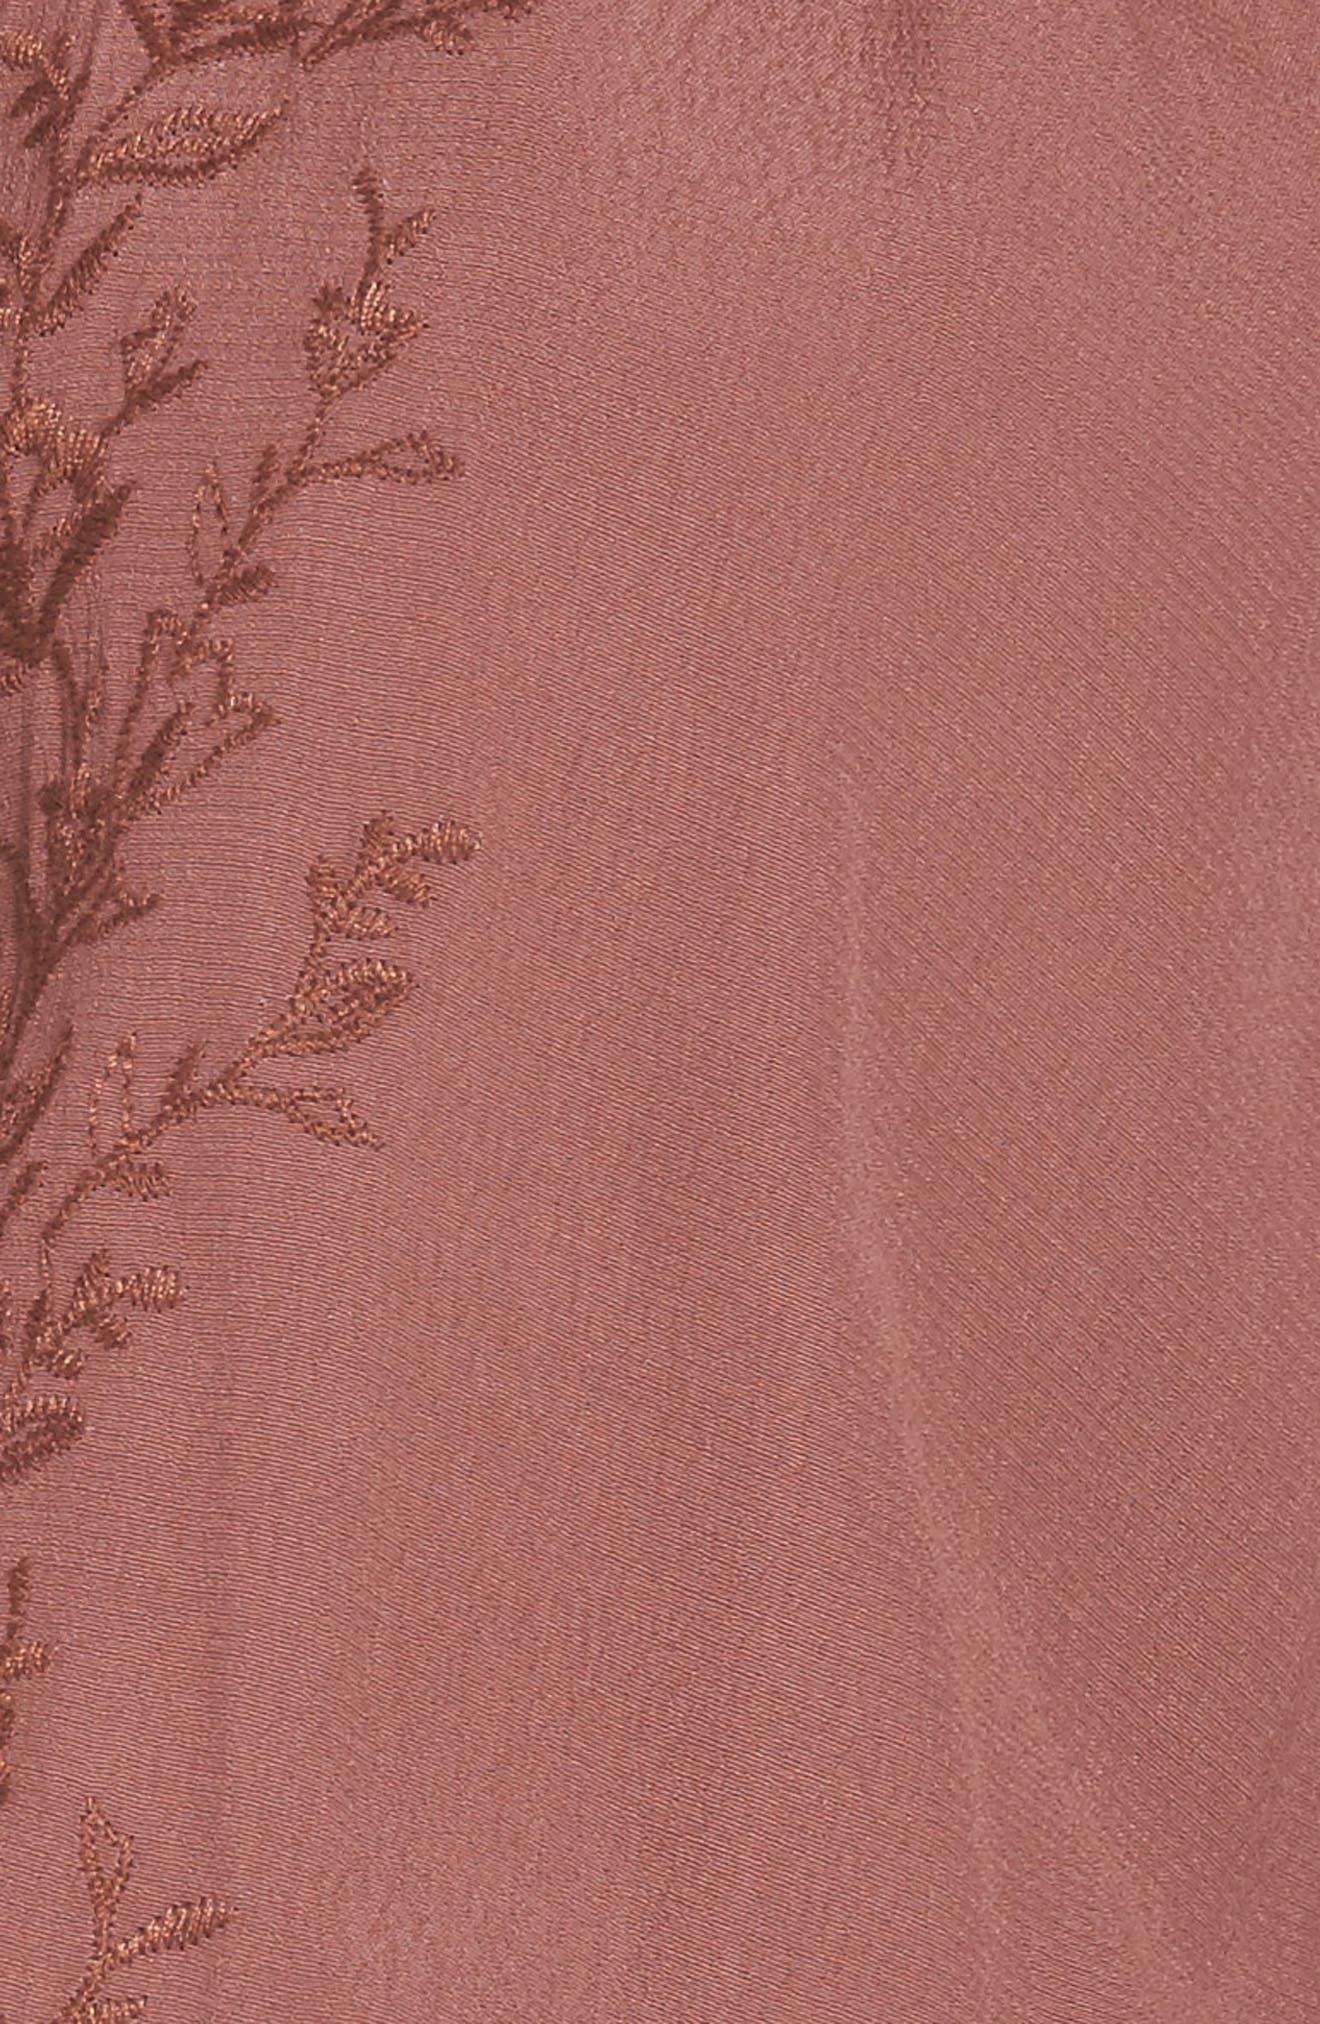 Melinda Blouson Dress,                             Alternate thumbnail 6, color,                             Dark Mauve